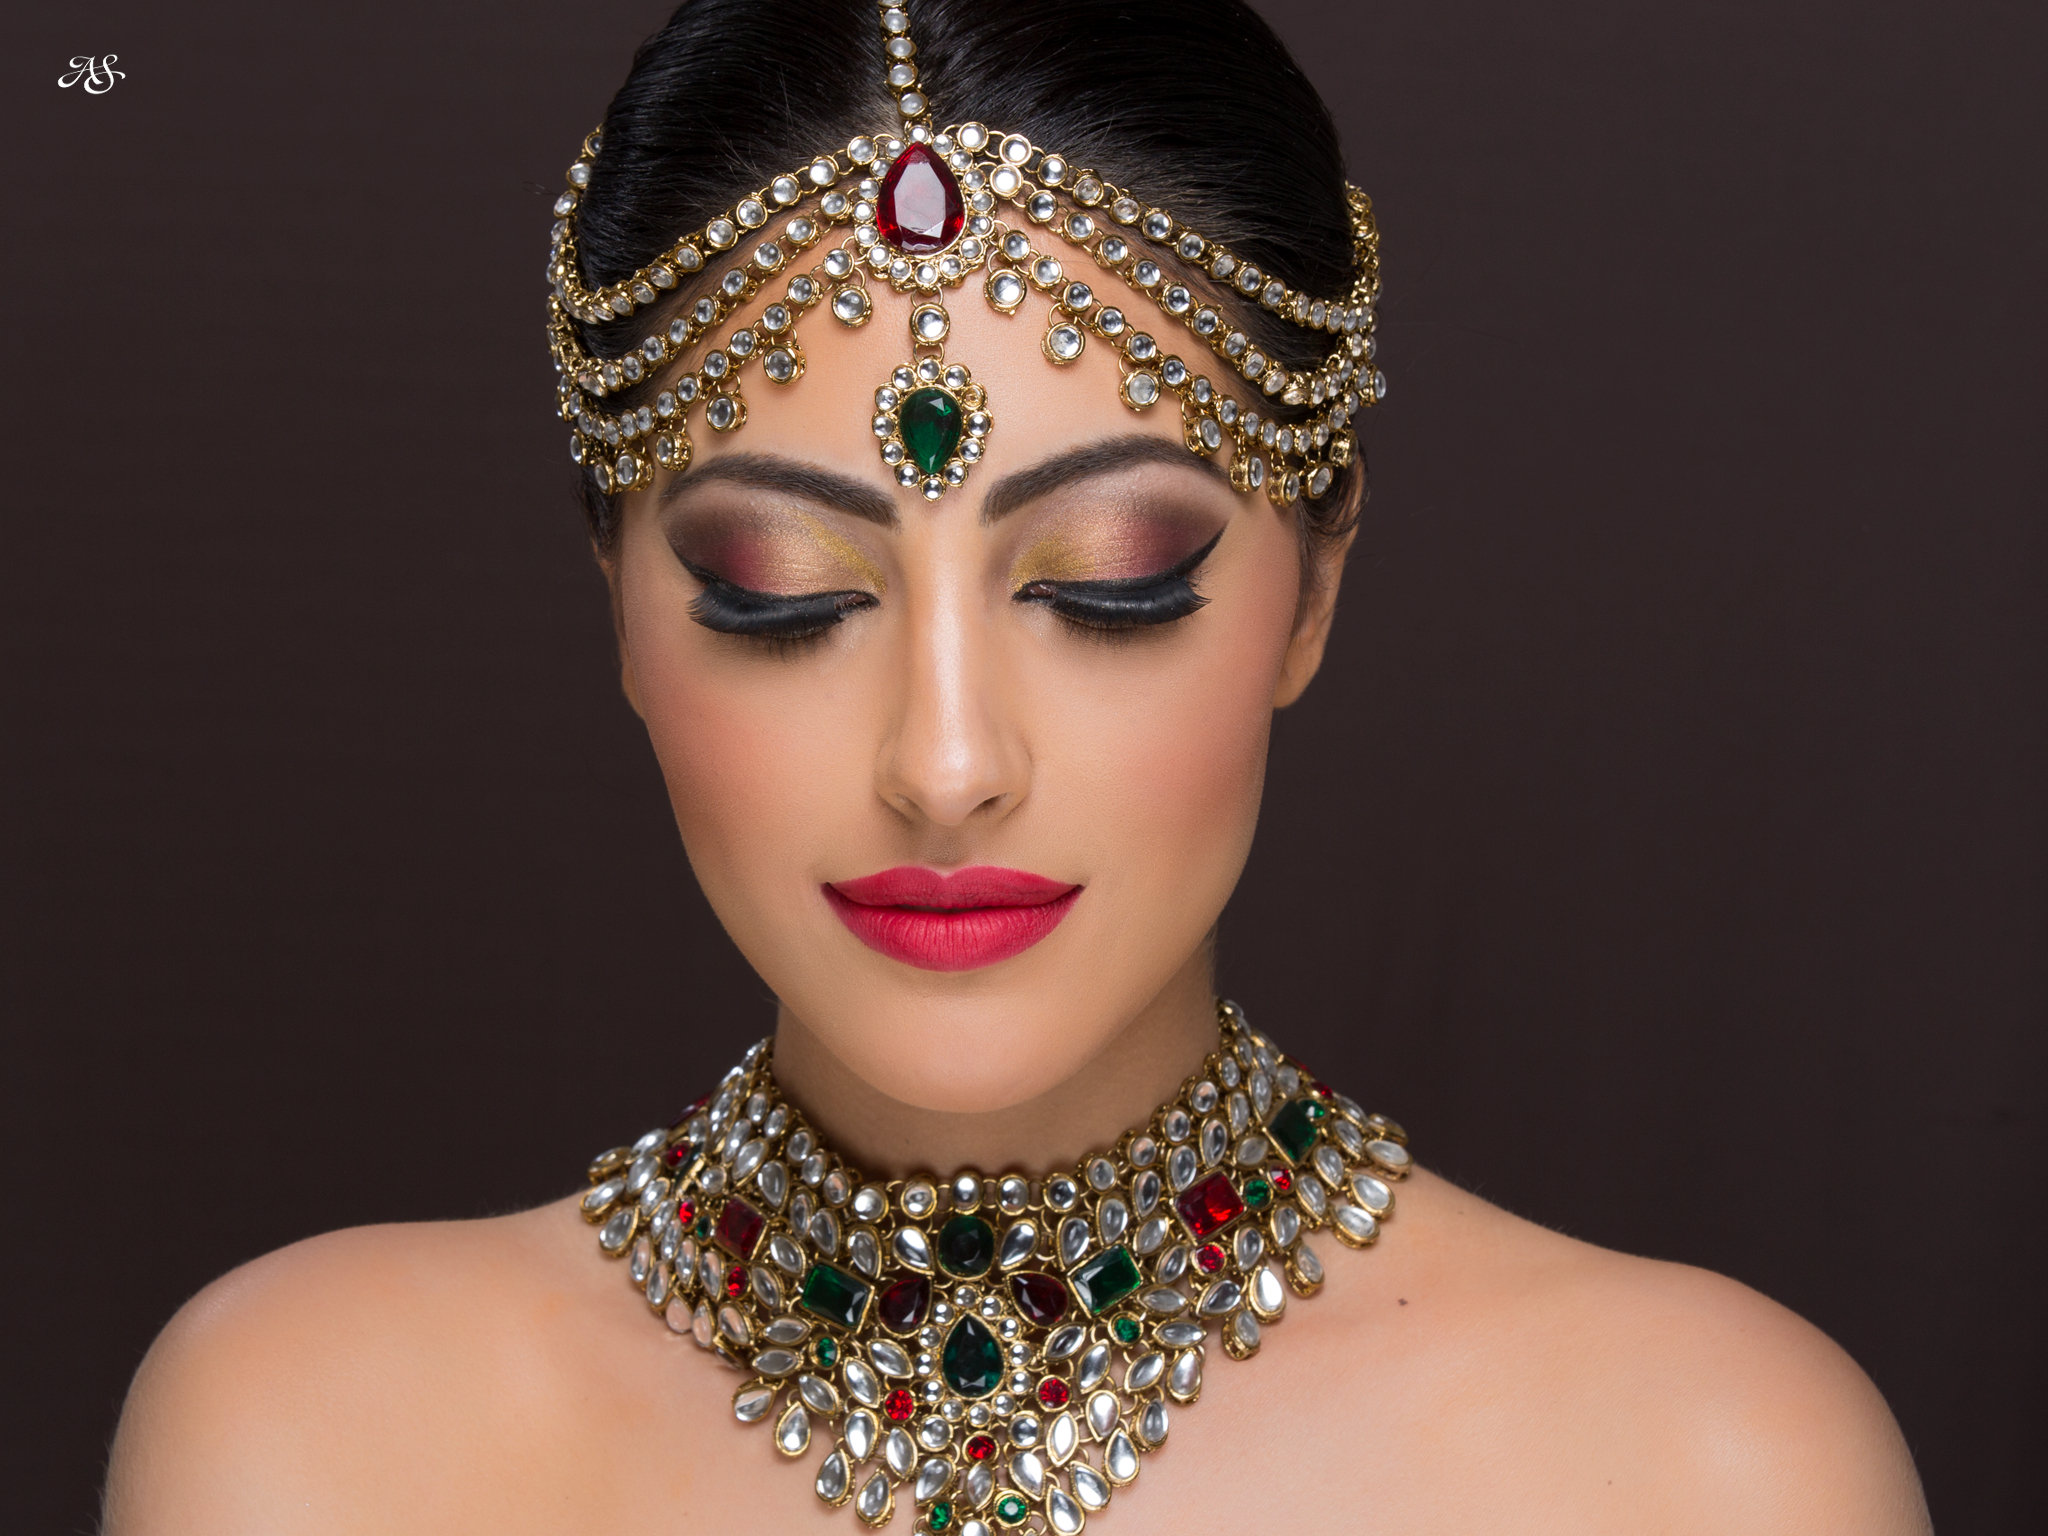 Makeup Artist in San Francisco, Bay Area - Abhilasha Singh